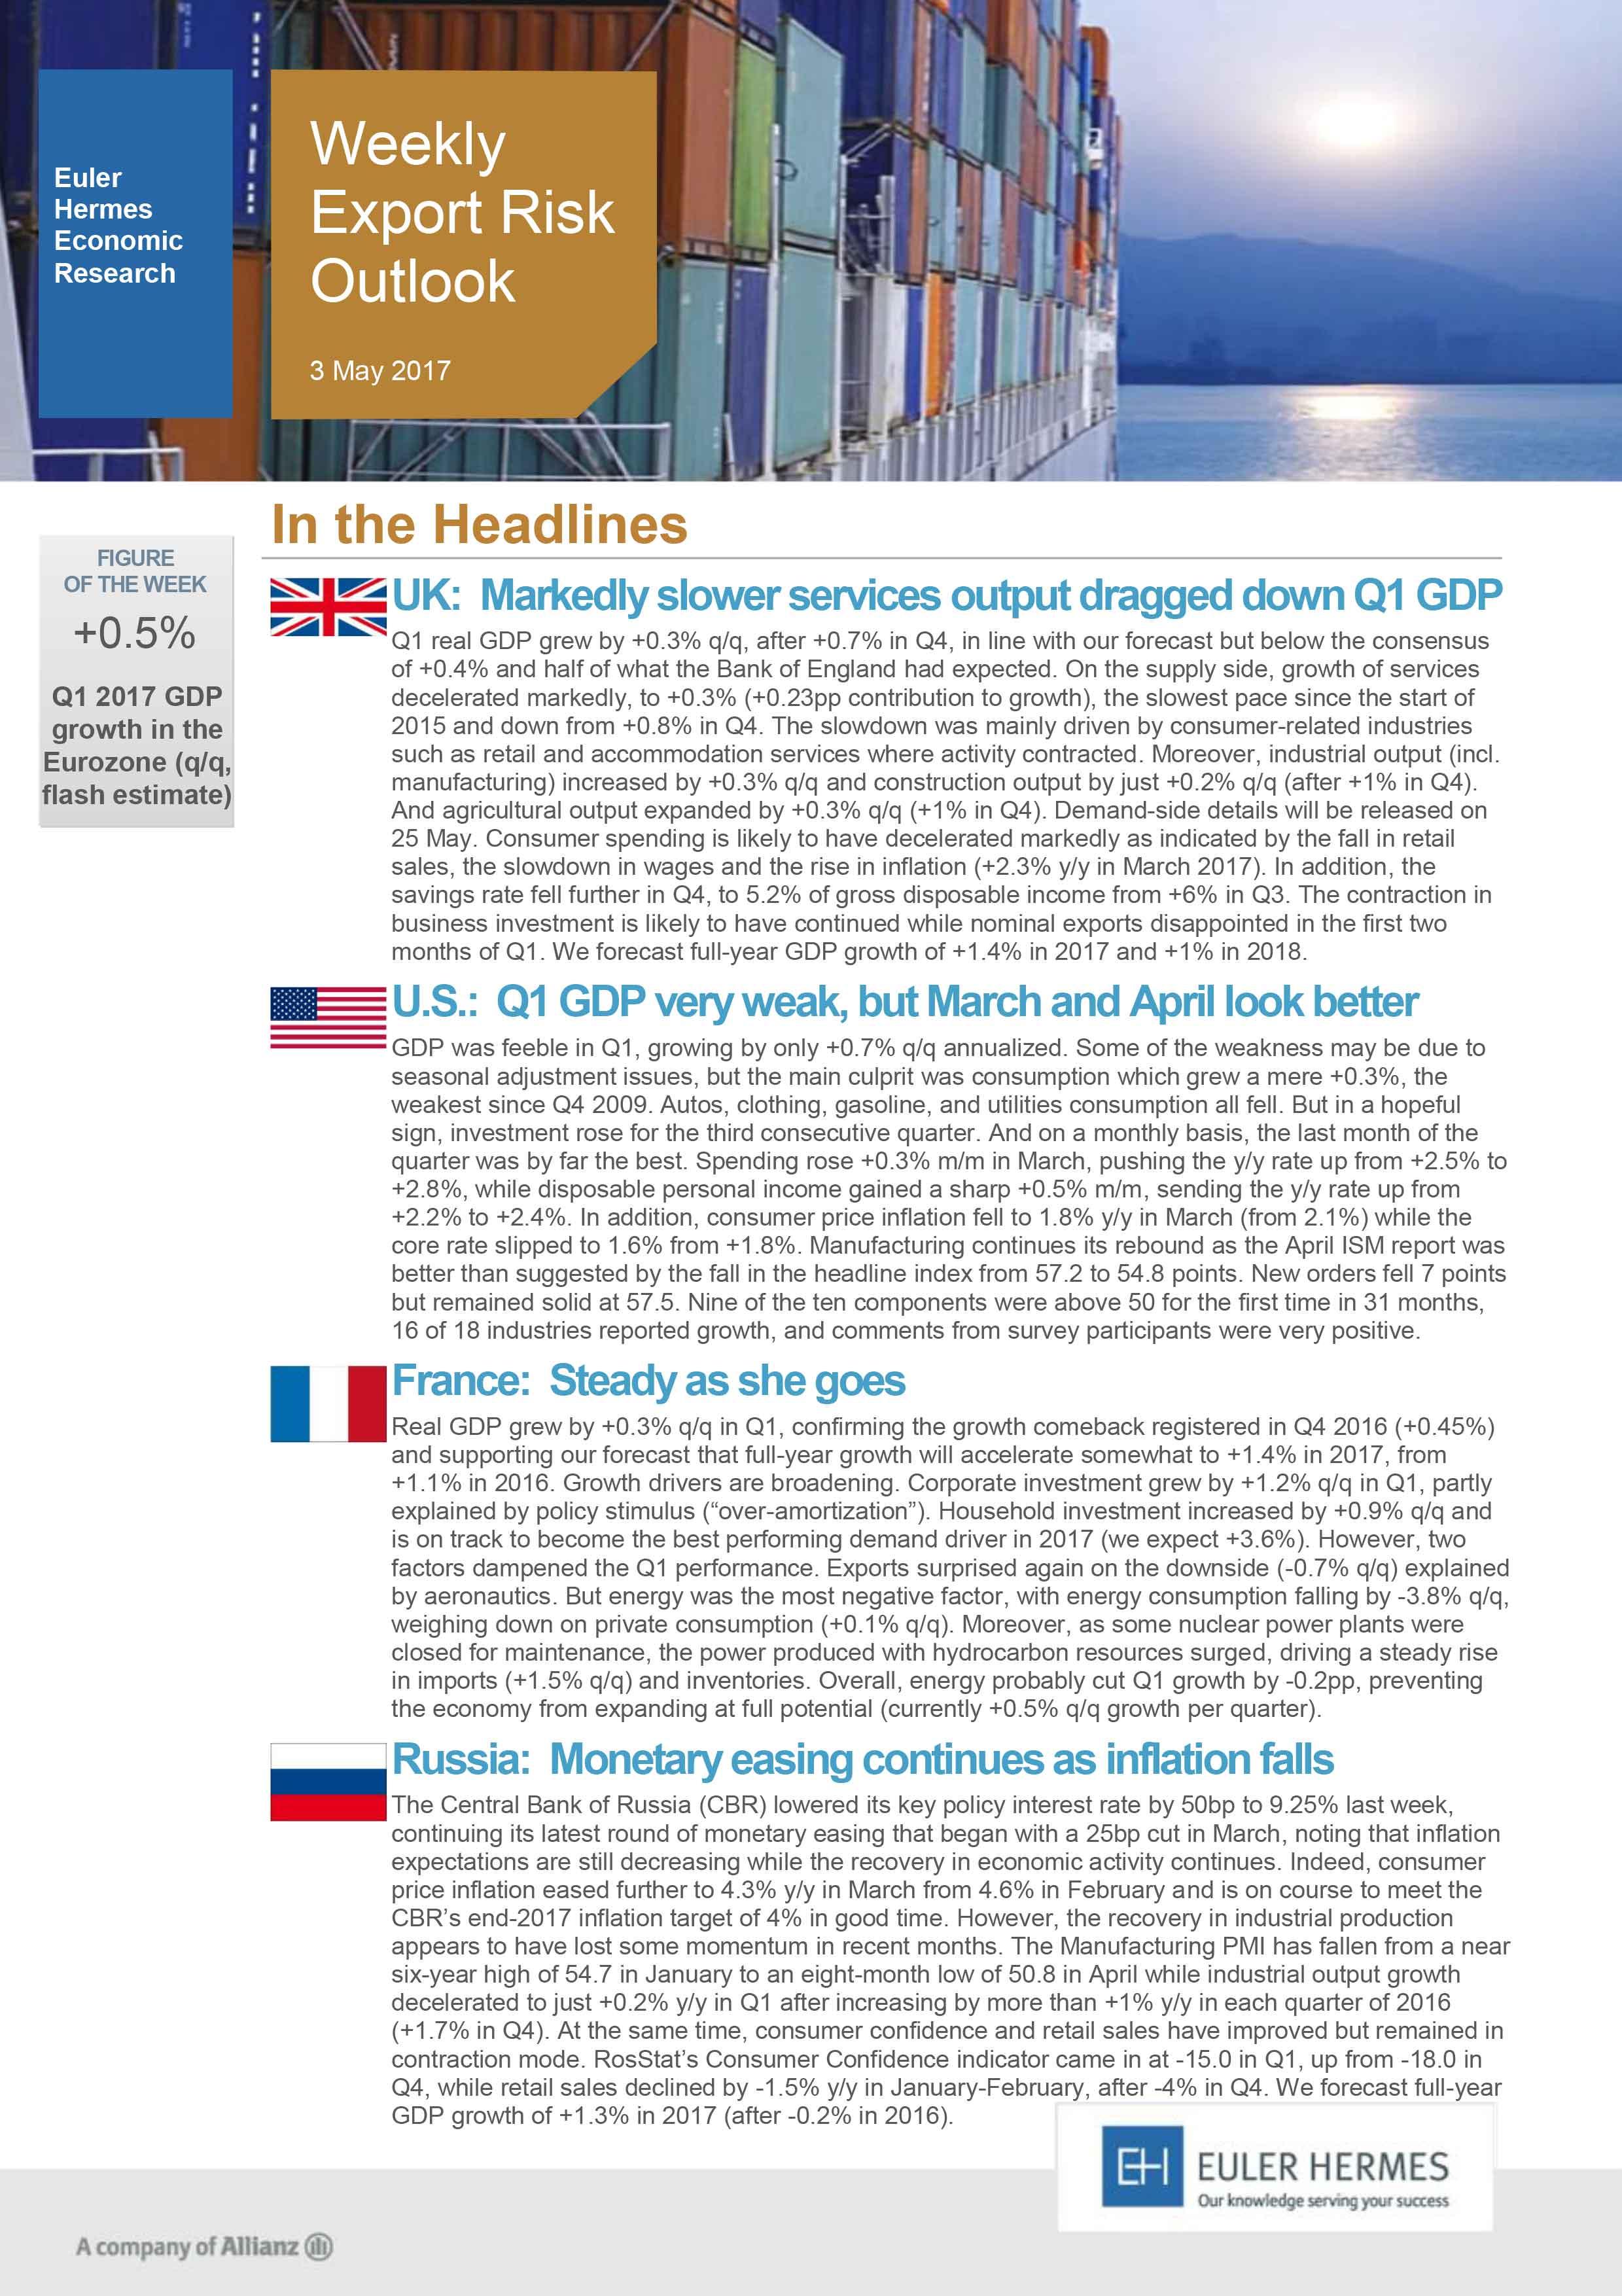 Weekly Export Risk Outlook 03/05/2017